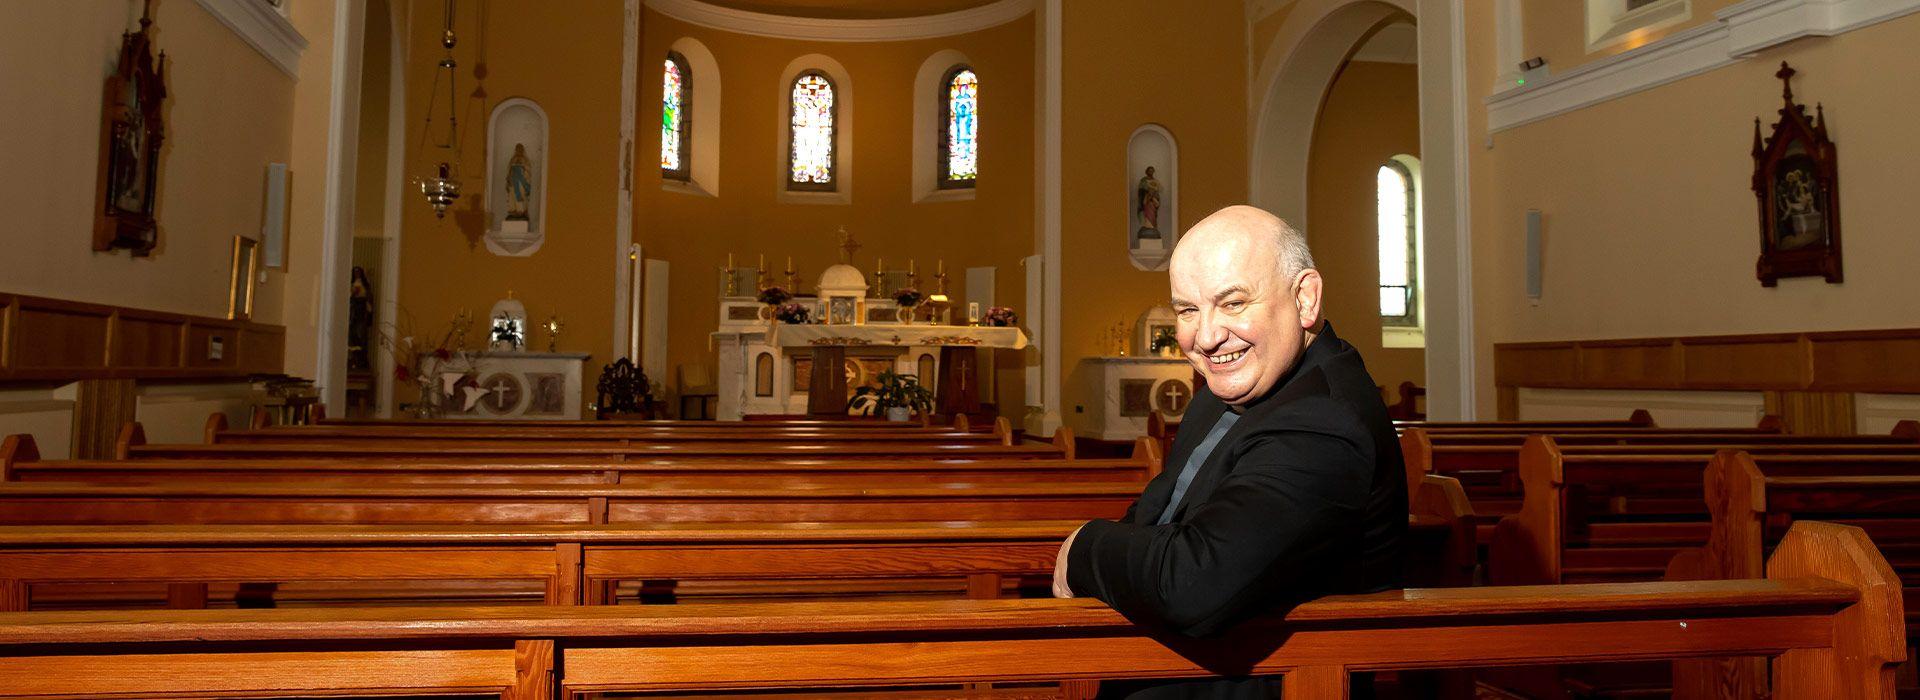 Fr Dan Cavanagh, Rosbercon